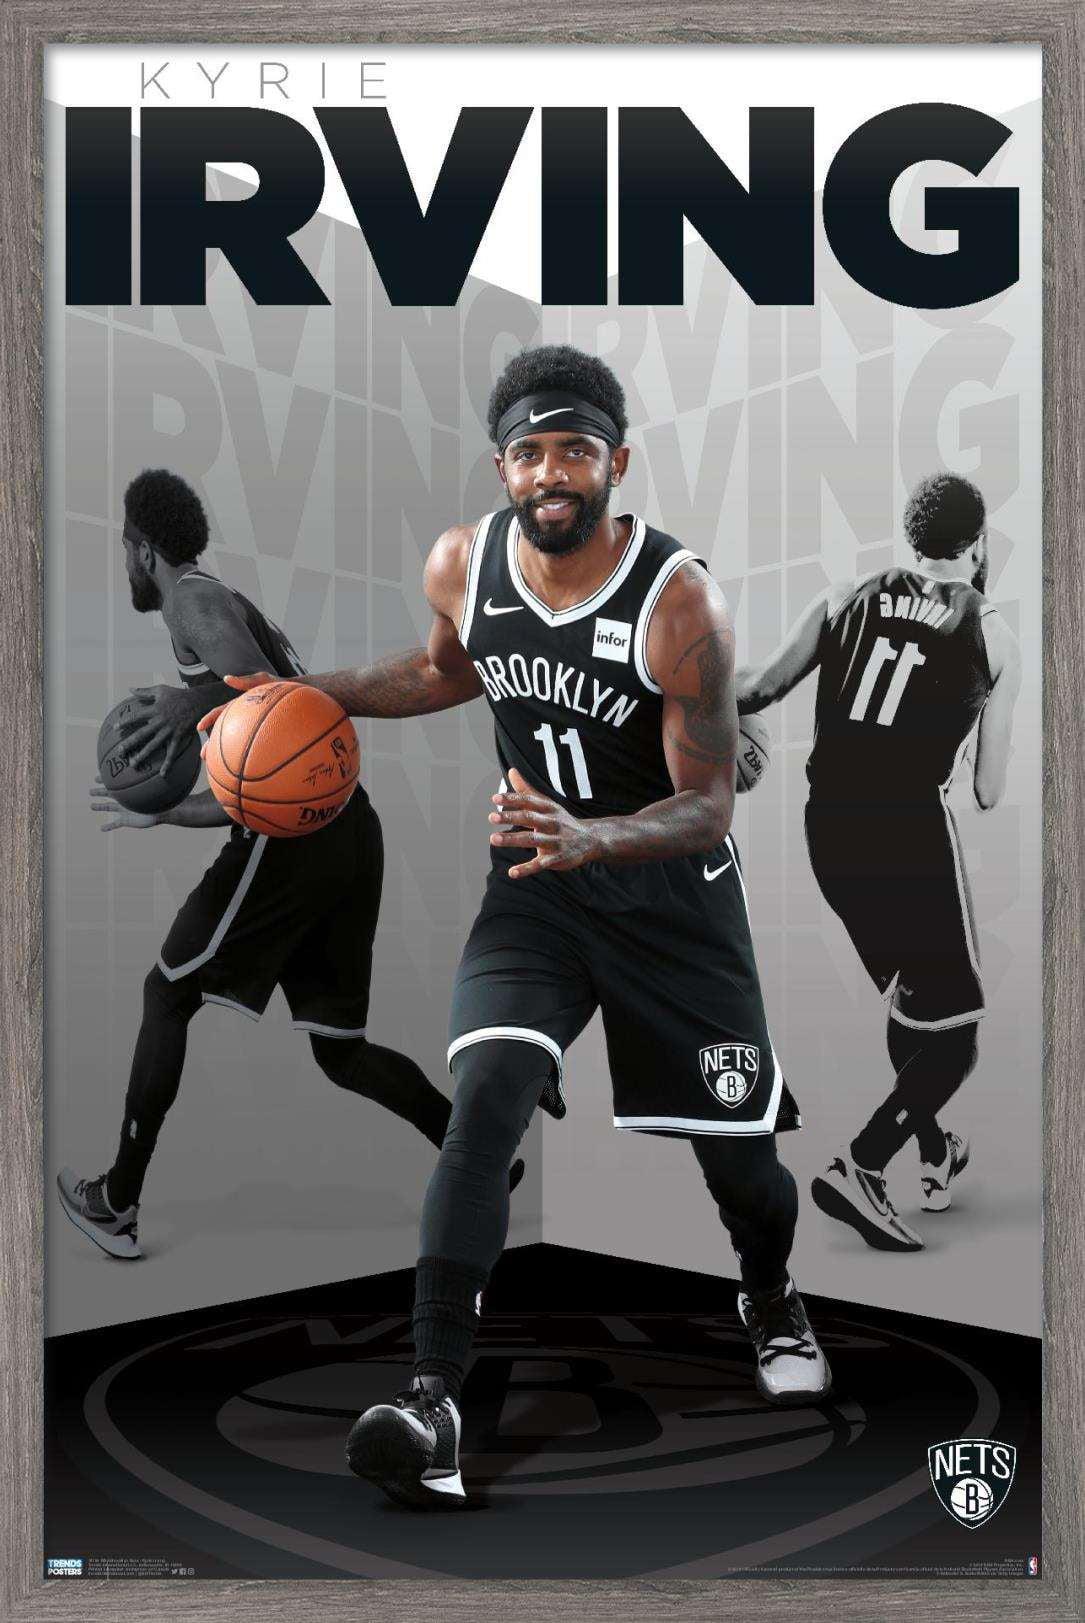 NBA Brooklyn Nets - Kyrie Irving Poster - Walmart.com - Walmart.com